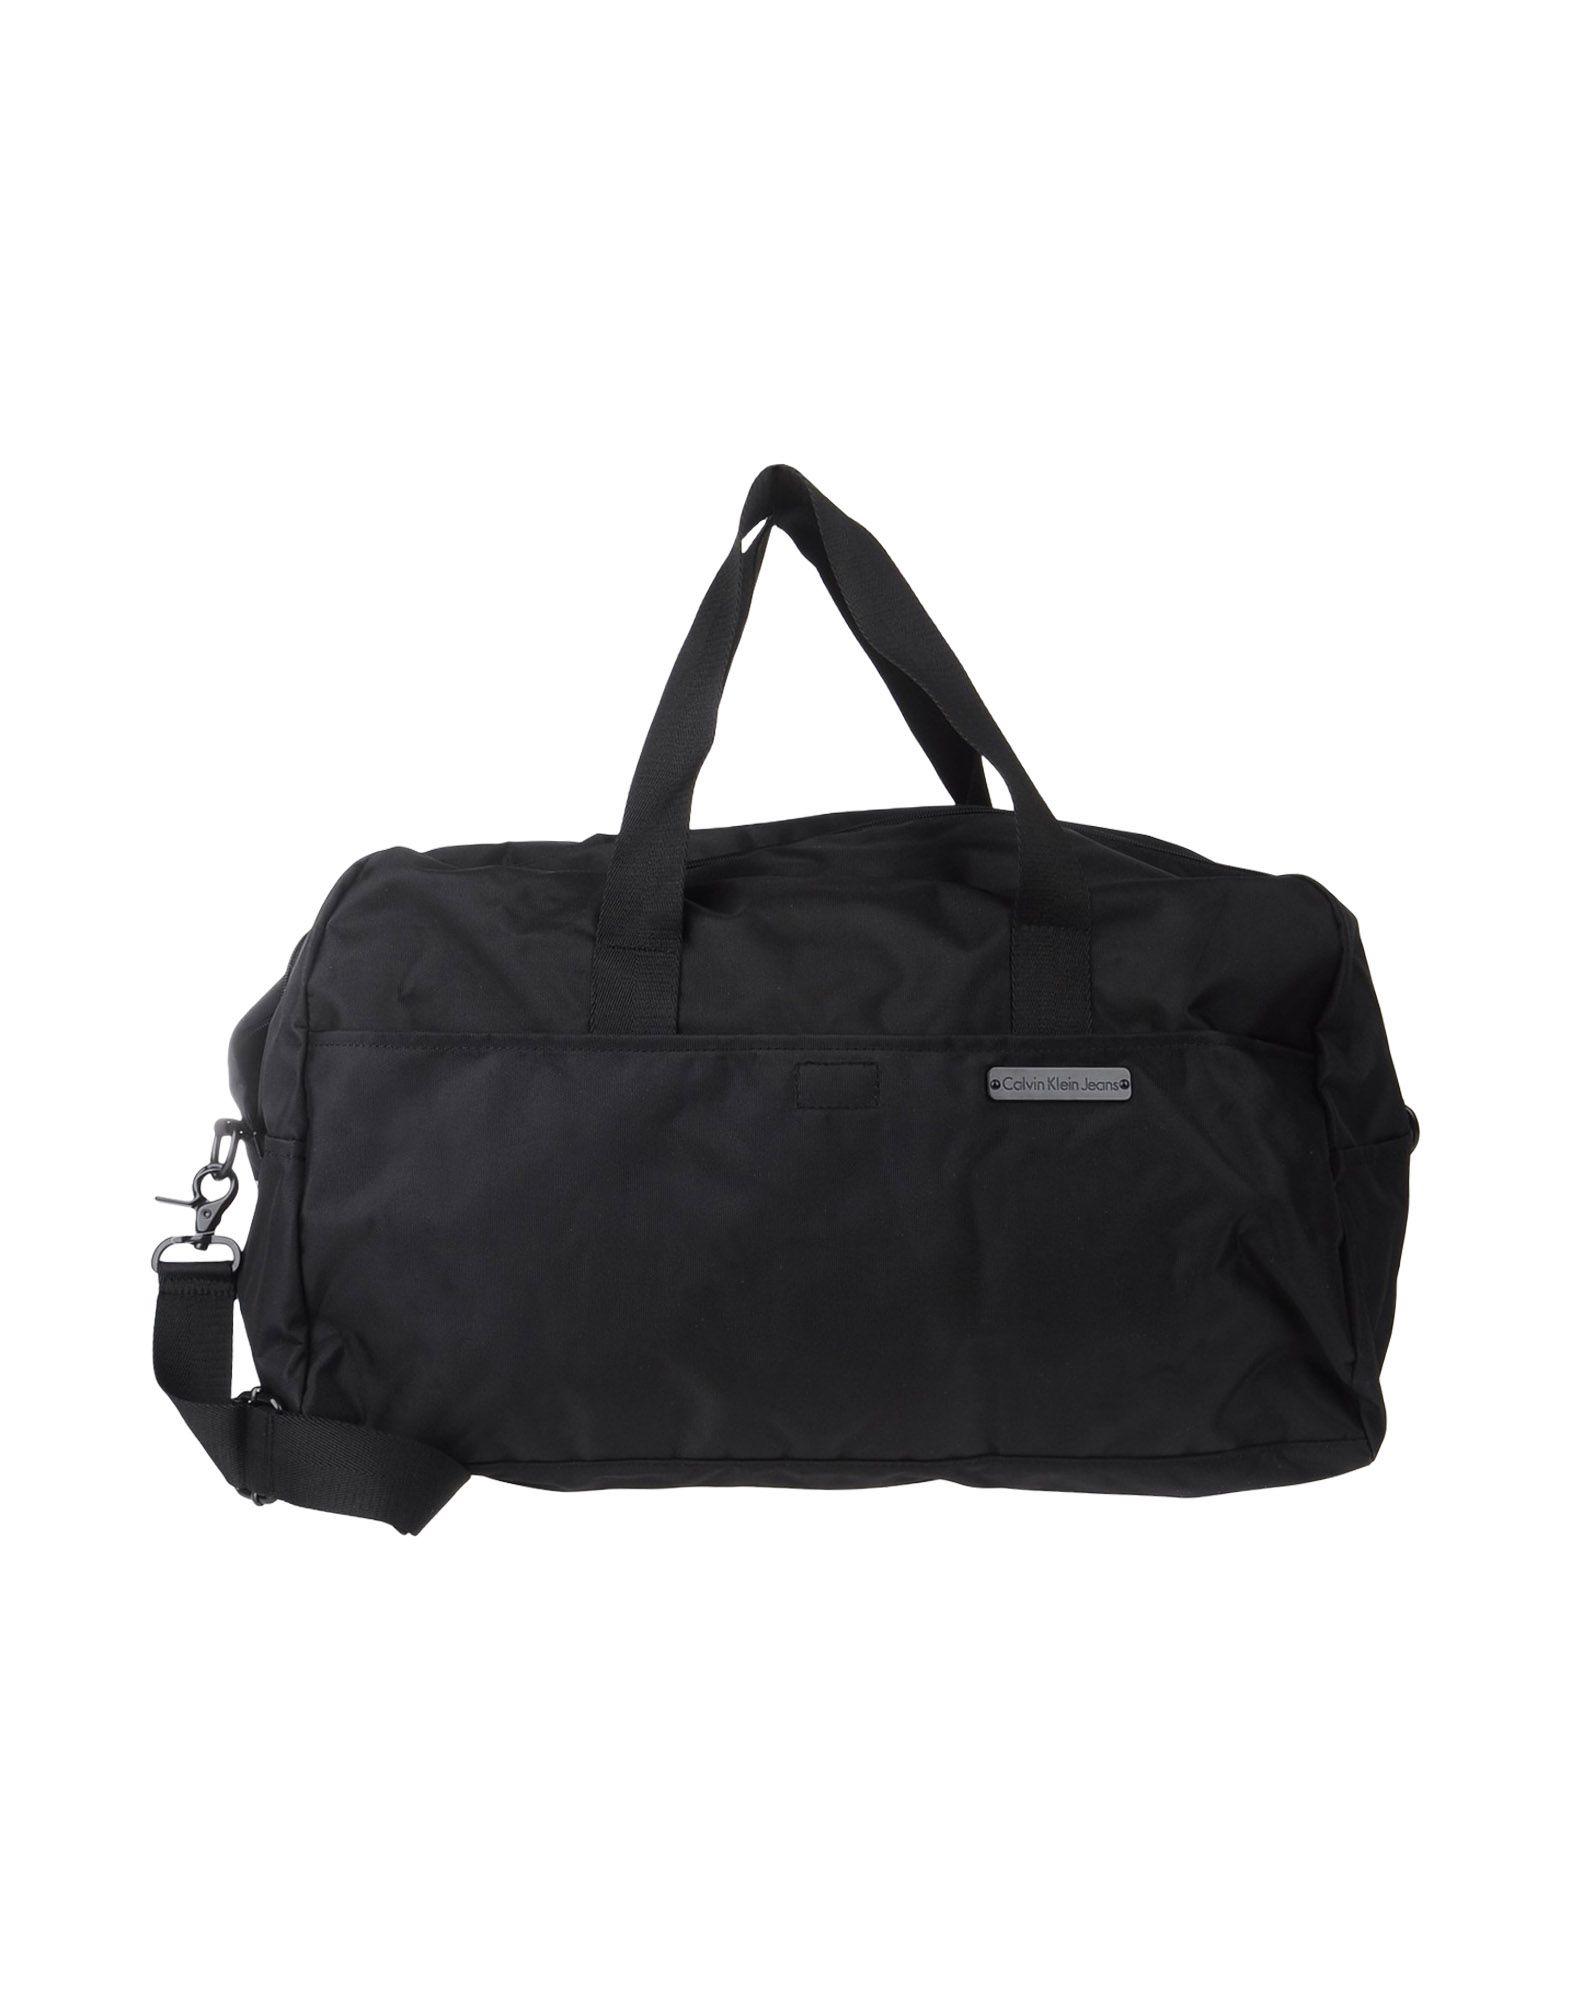 Calvin Klein Jeans Travel Duffel Bag In Black Lyst